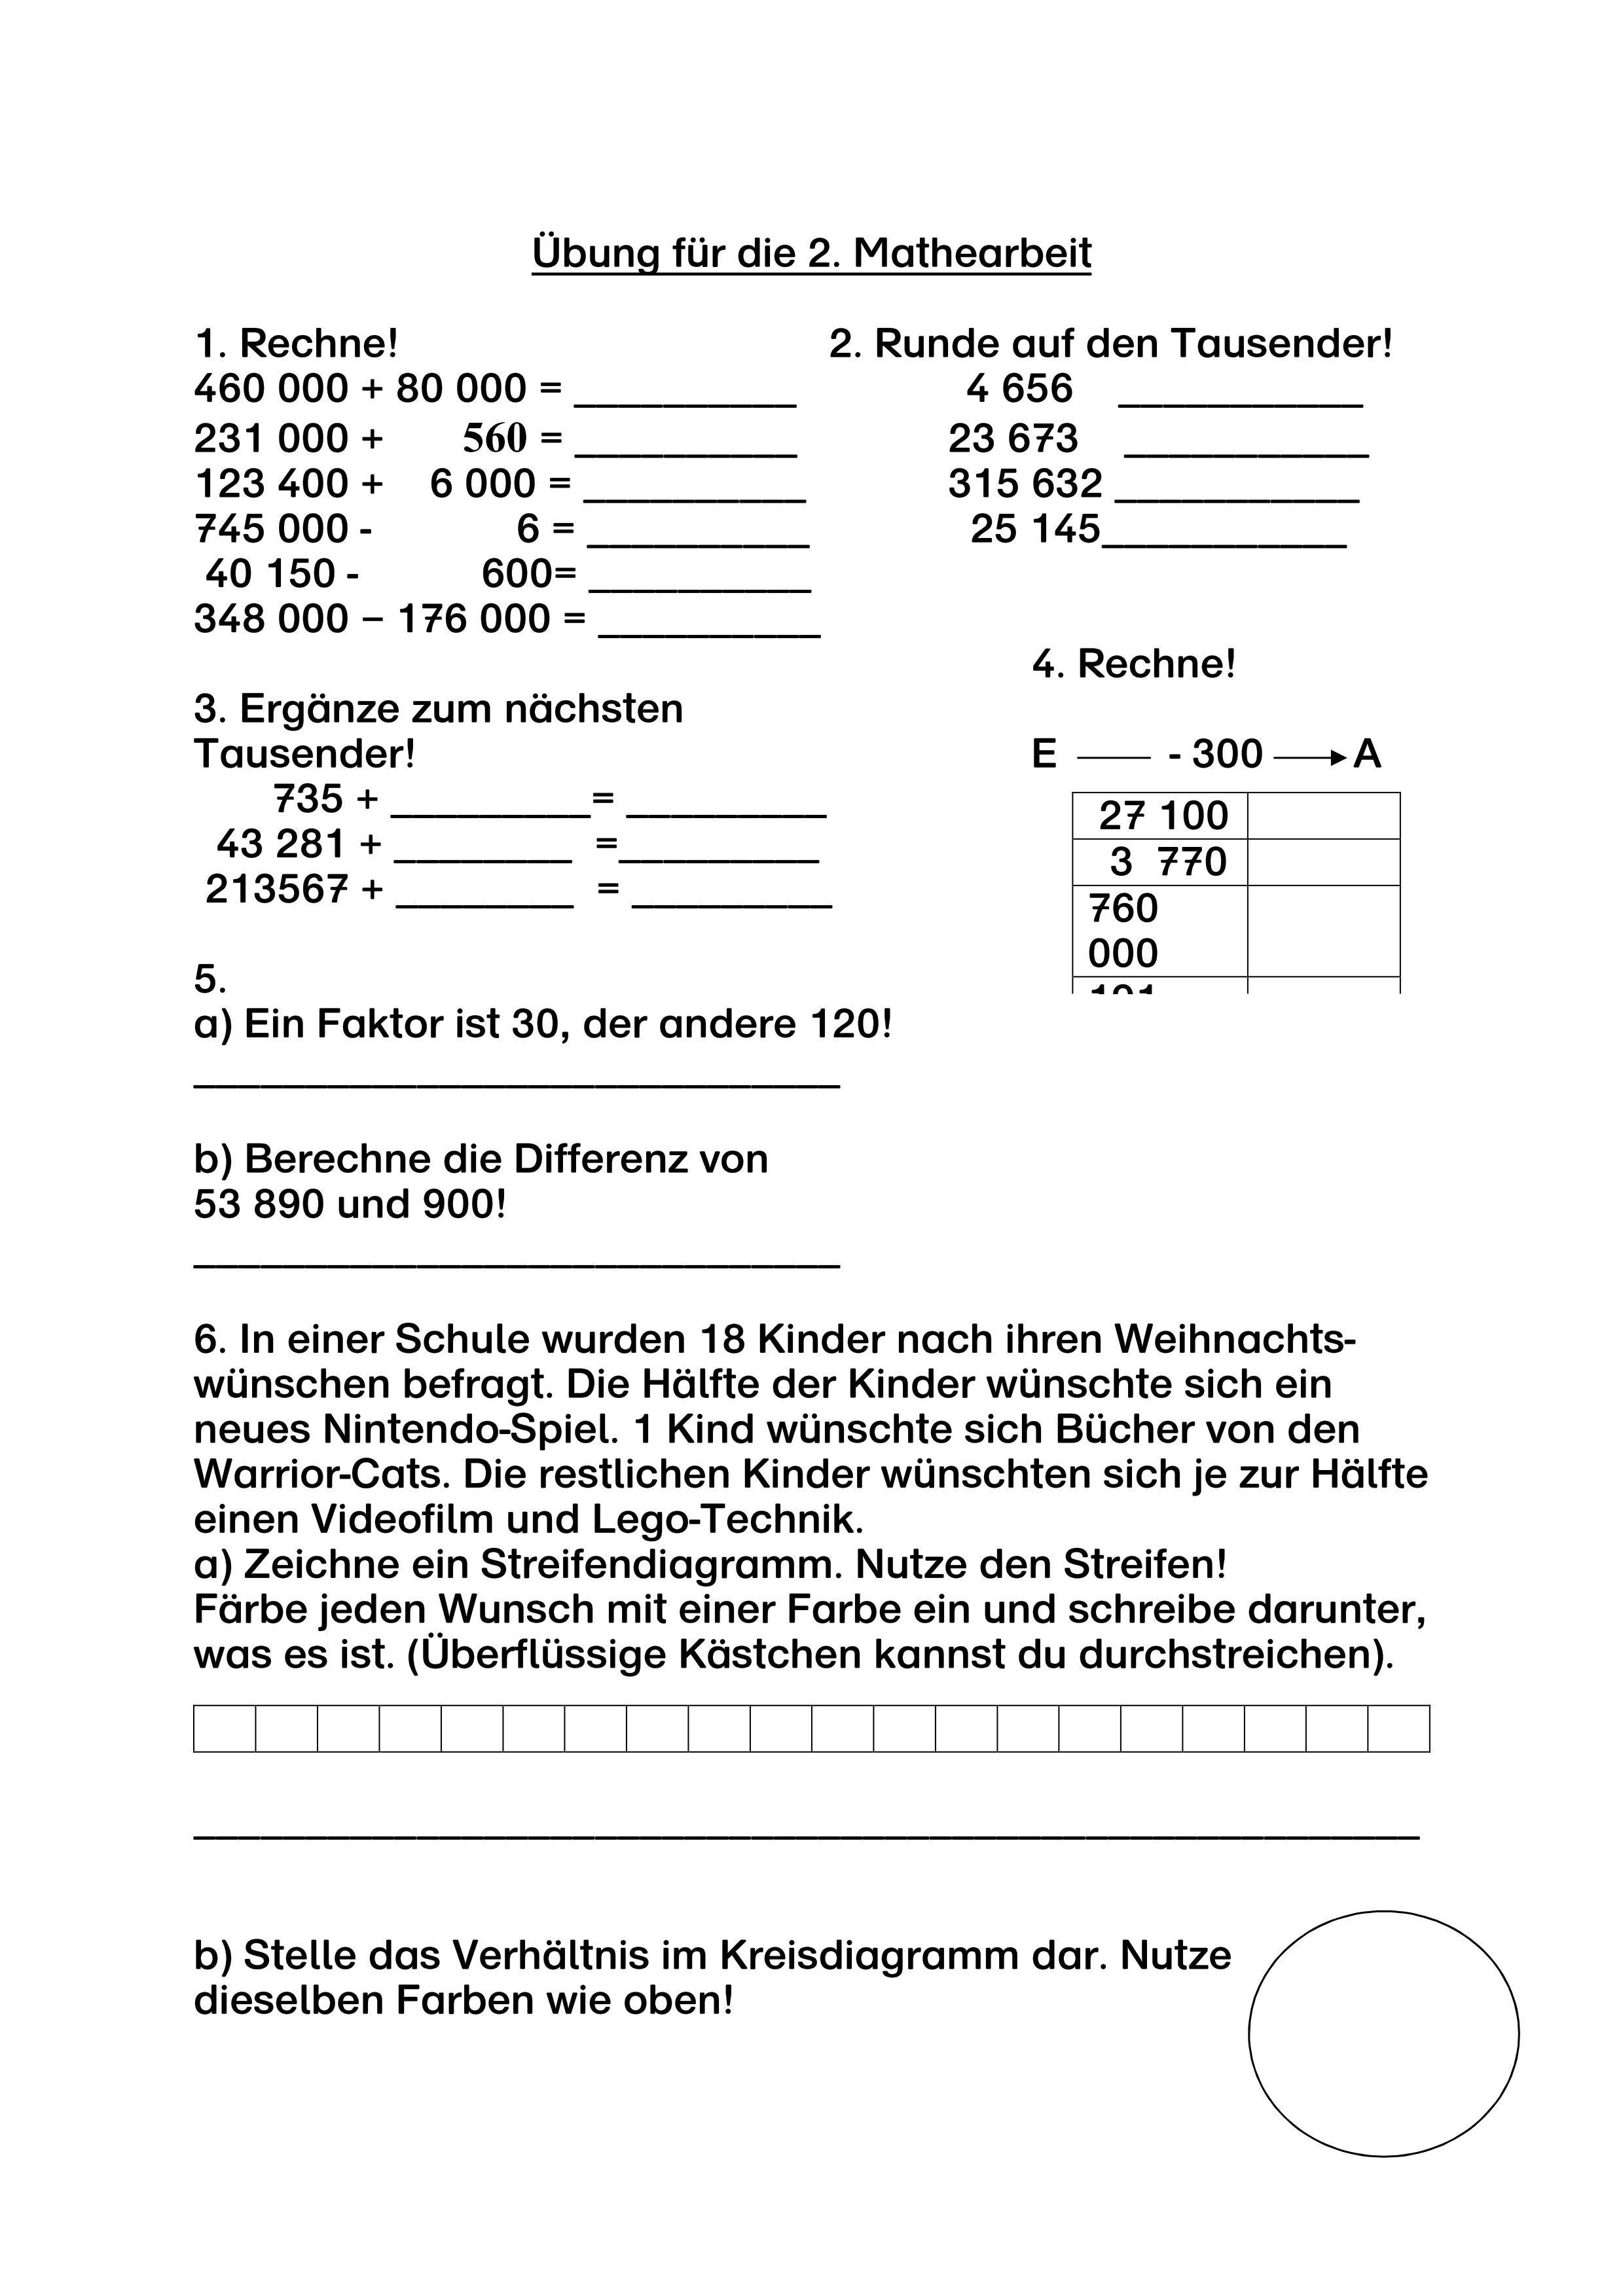 2 Mathearbeit Klasse 4 Mit Vorbereitung Unterrichtsmaterial Im Fach Mathematik Klassenarbeiten Mathe Klasse 4 Mathematik Mathe